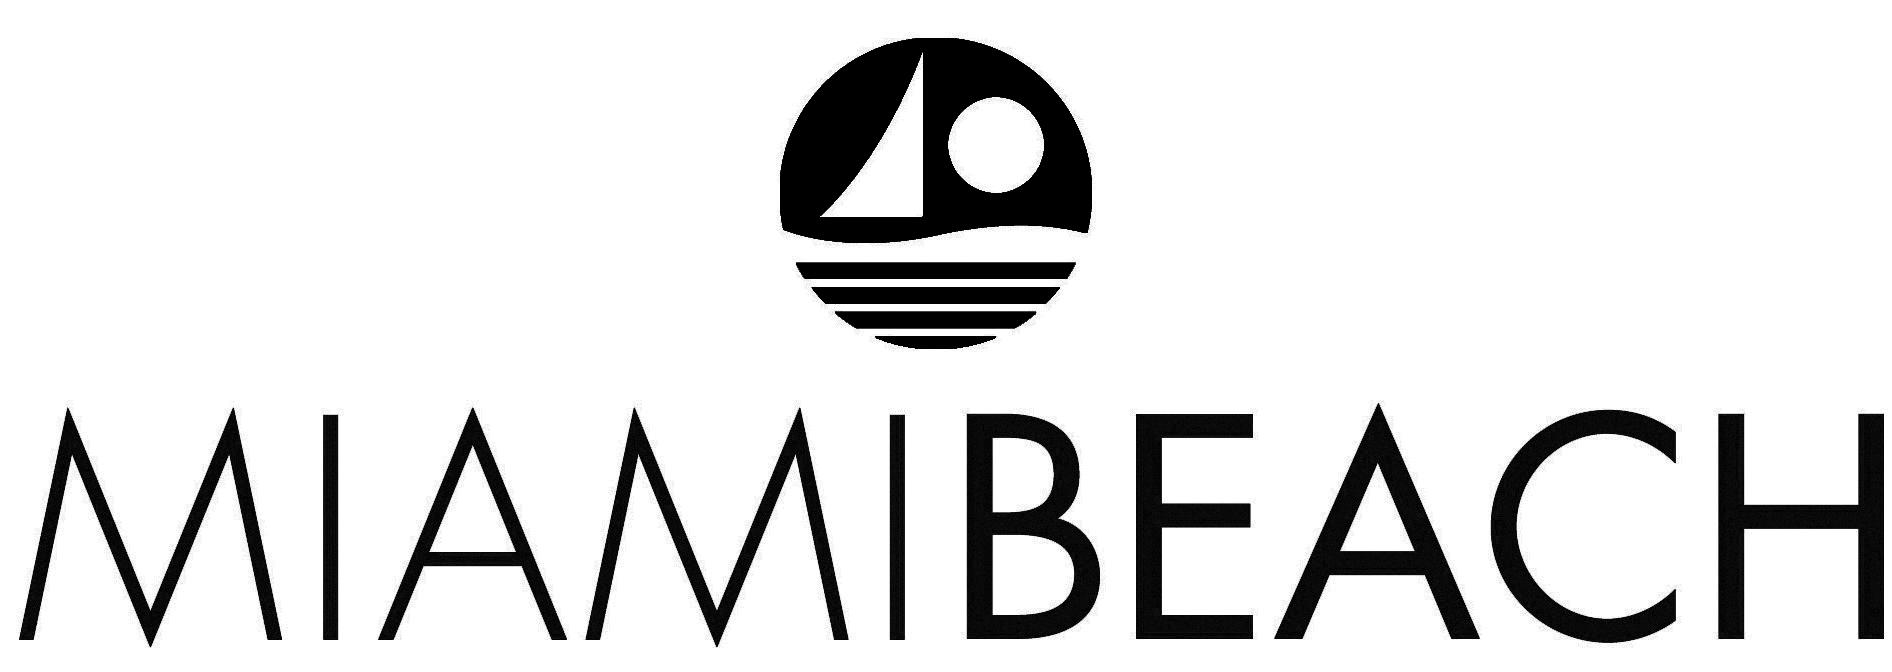 City MiamiBeach Logo1.jpg